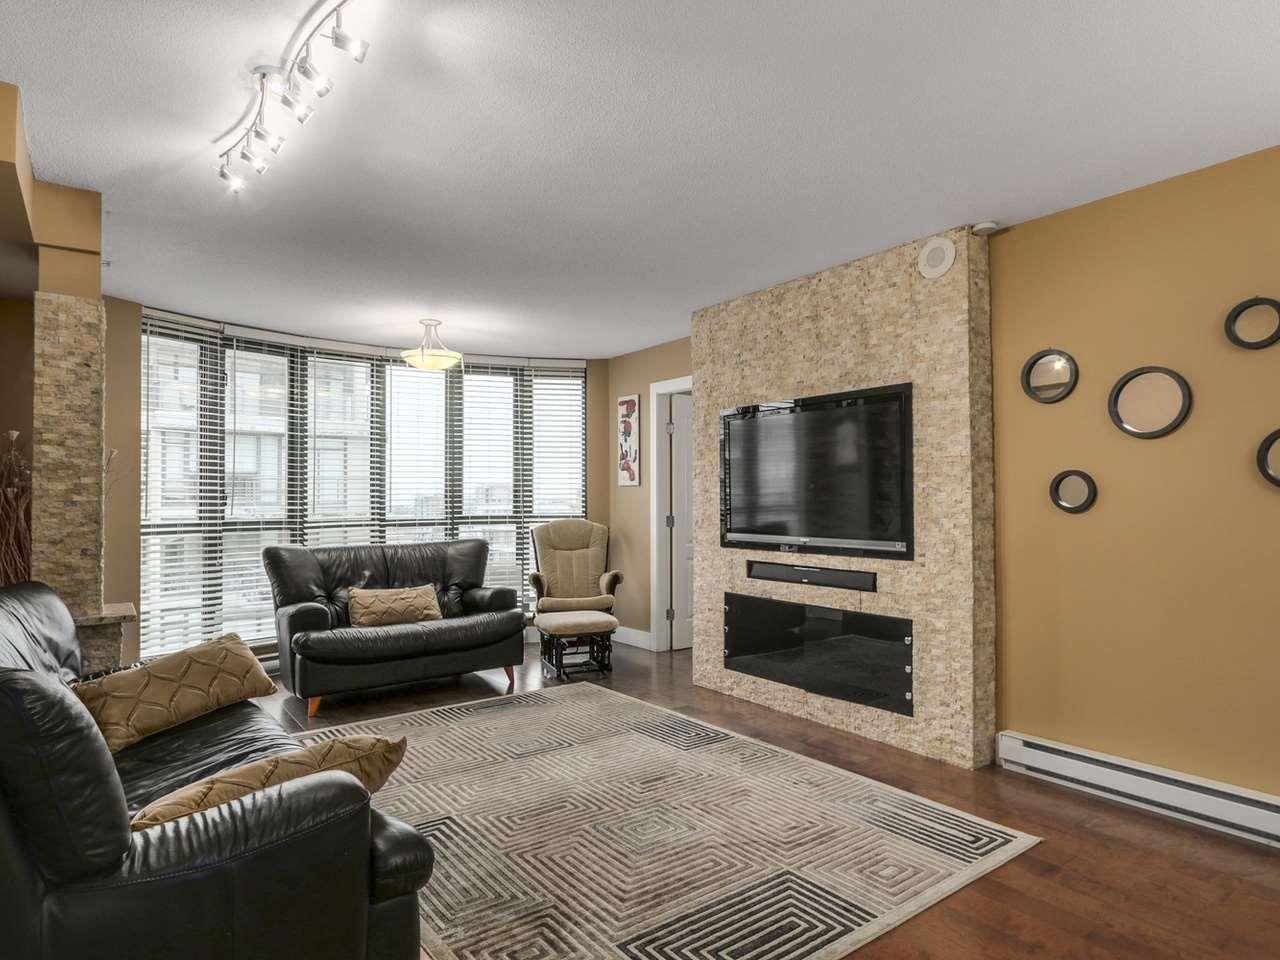 Main Photo: 1707 7380 ELMBRIDGE Way in Richmond: Brighouse Condo for sale : MLS®# R2120927